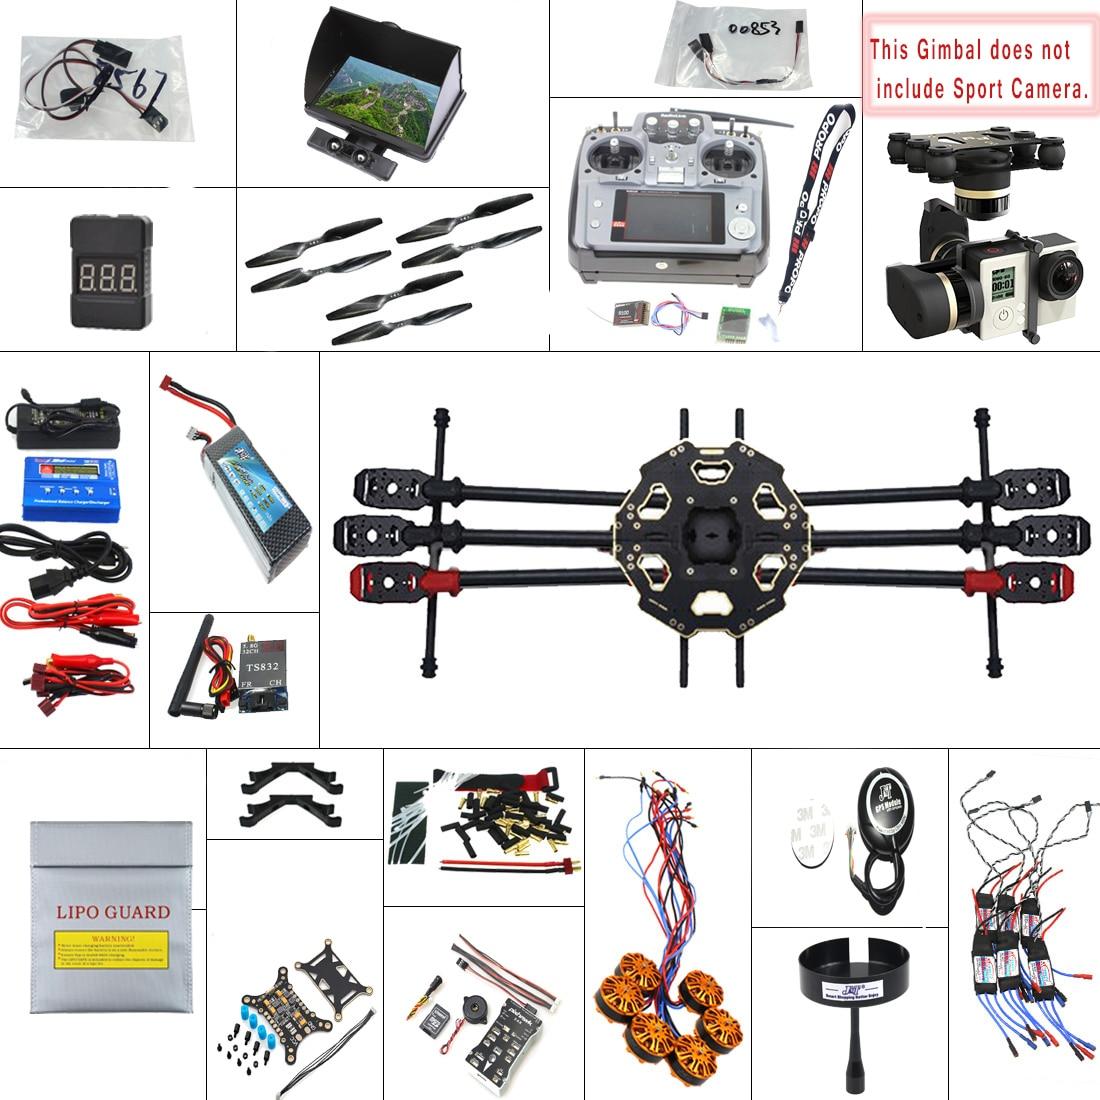 F07807-F 680PRO PX4 GPS 2.4G 10CH 5.8G Video FPV RC Hexacopter Unassembled Full Kit RTF DIY RC Drone Combo MINI3D Pro Gimbal